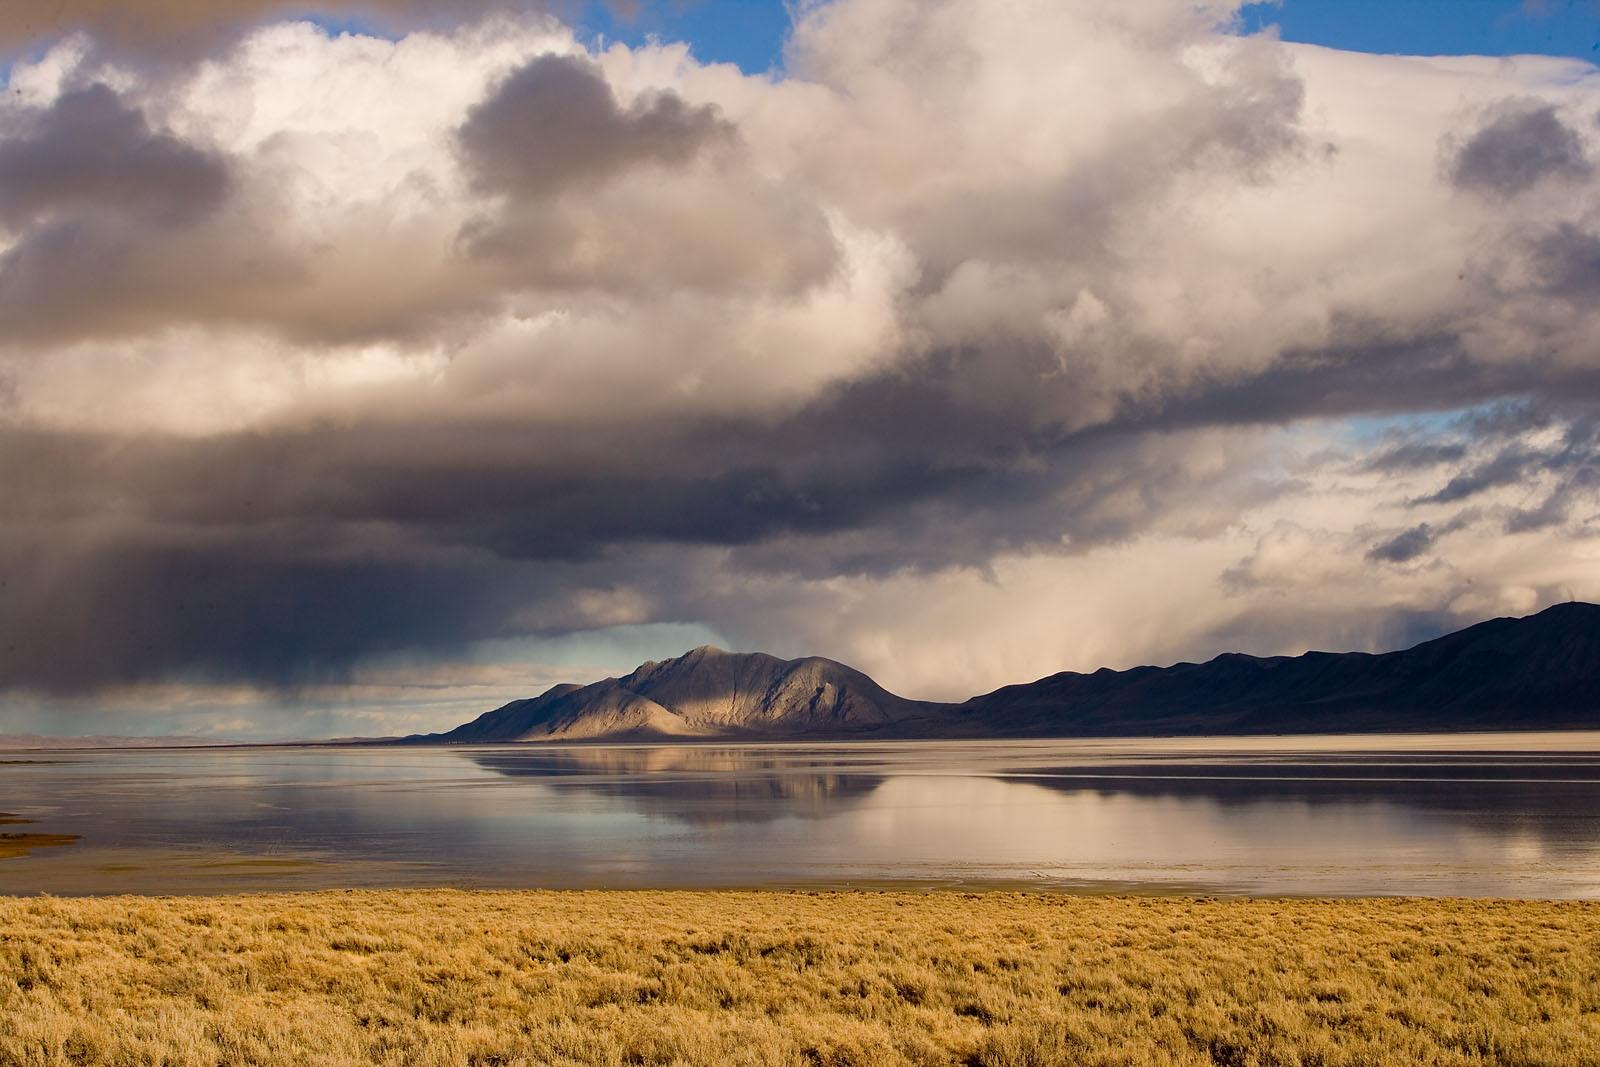 Bassett Scenic Landscape Vistas Q4G0282